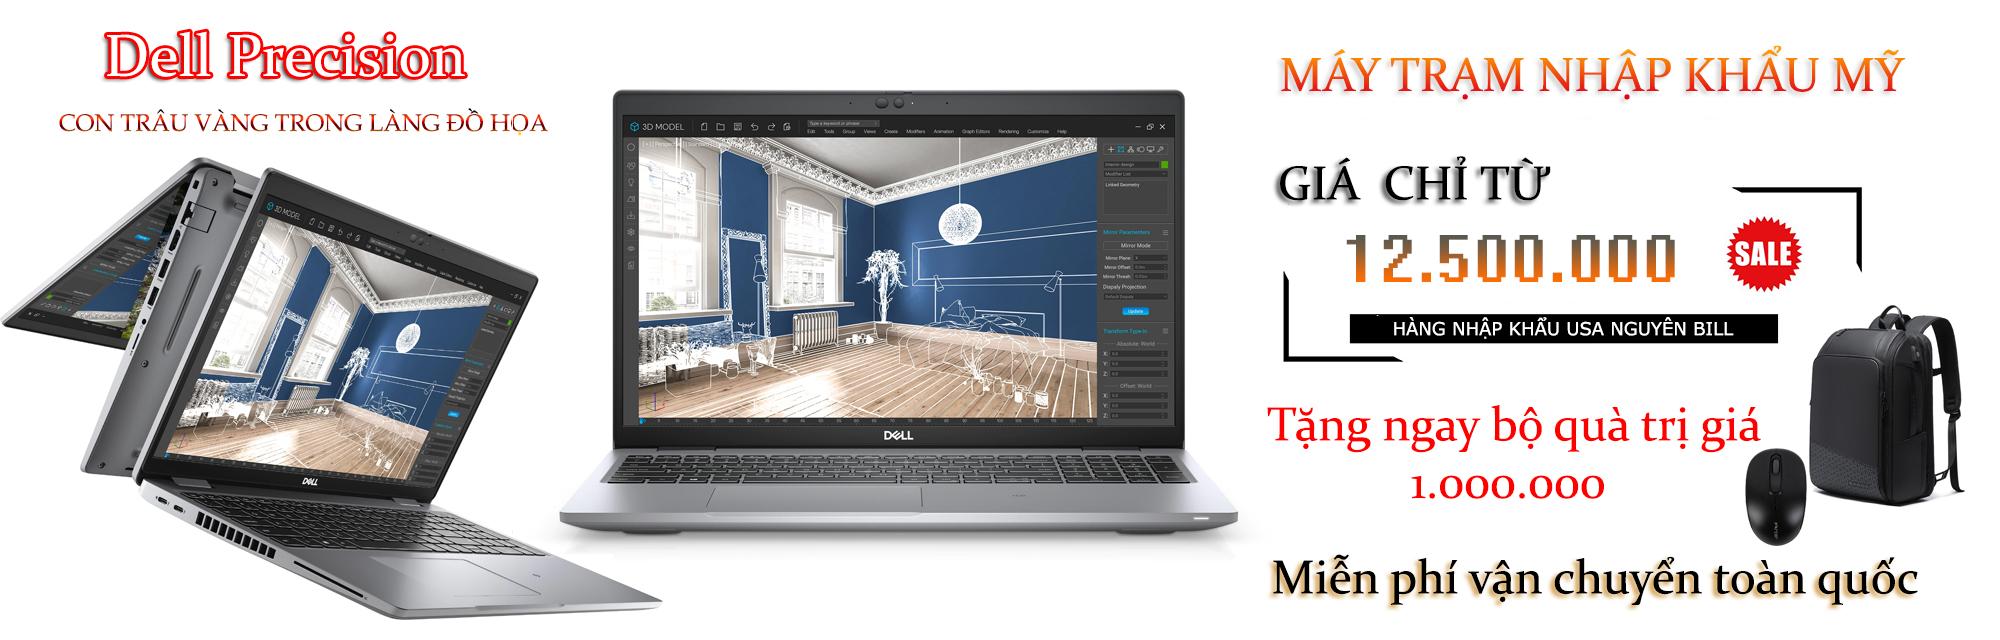 Laptop đồ họa Dell Precision